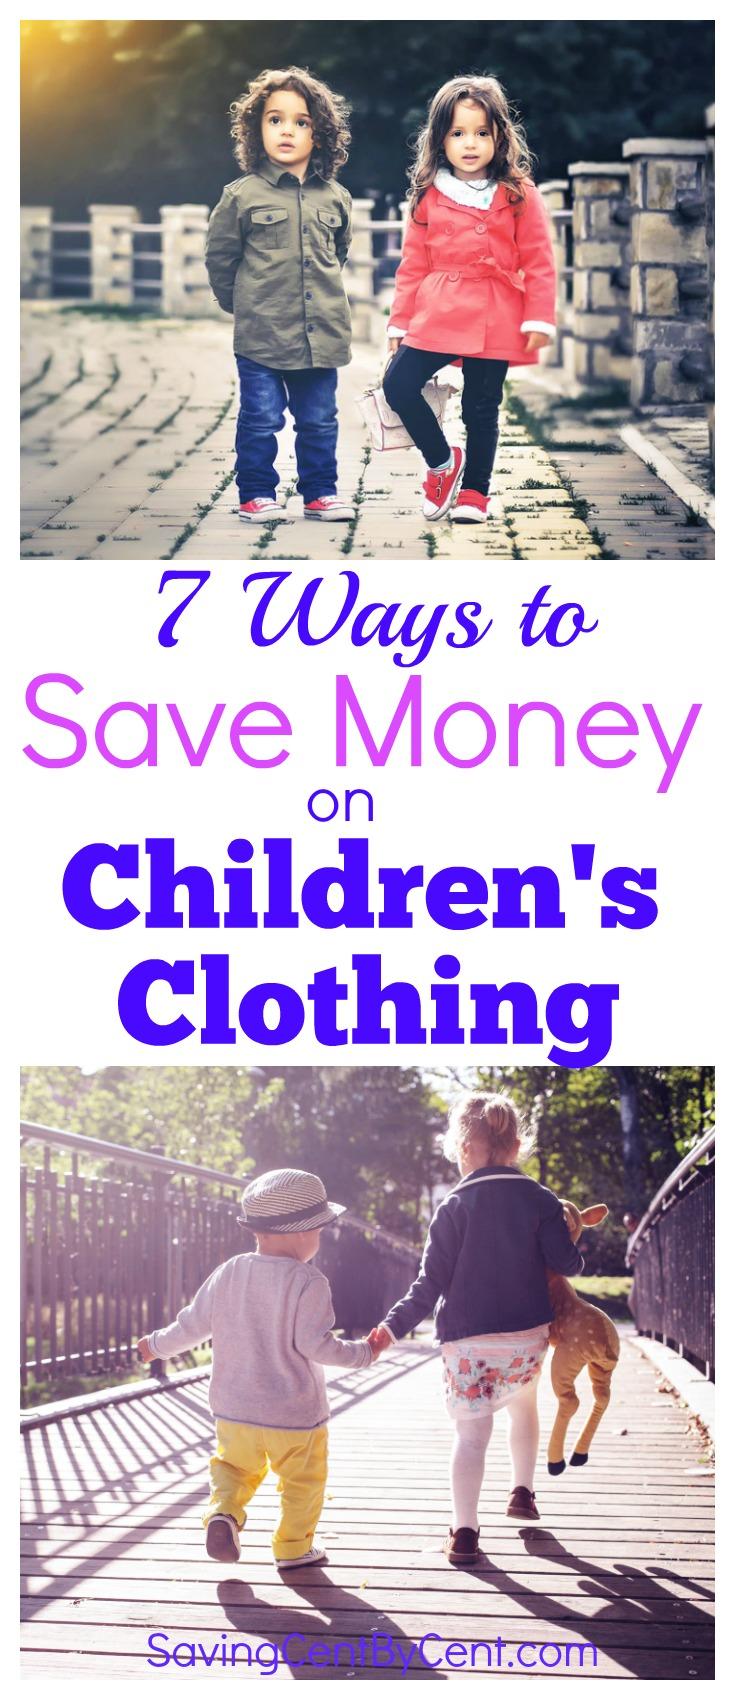 Save Money on Children's Clothing